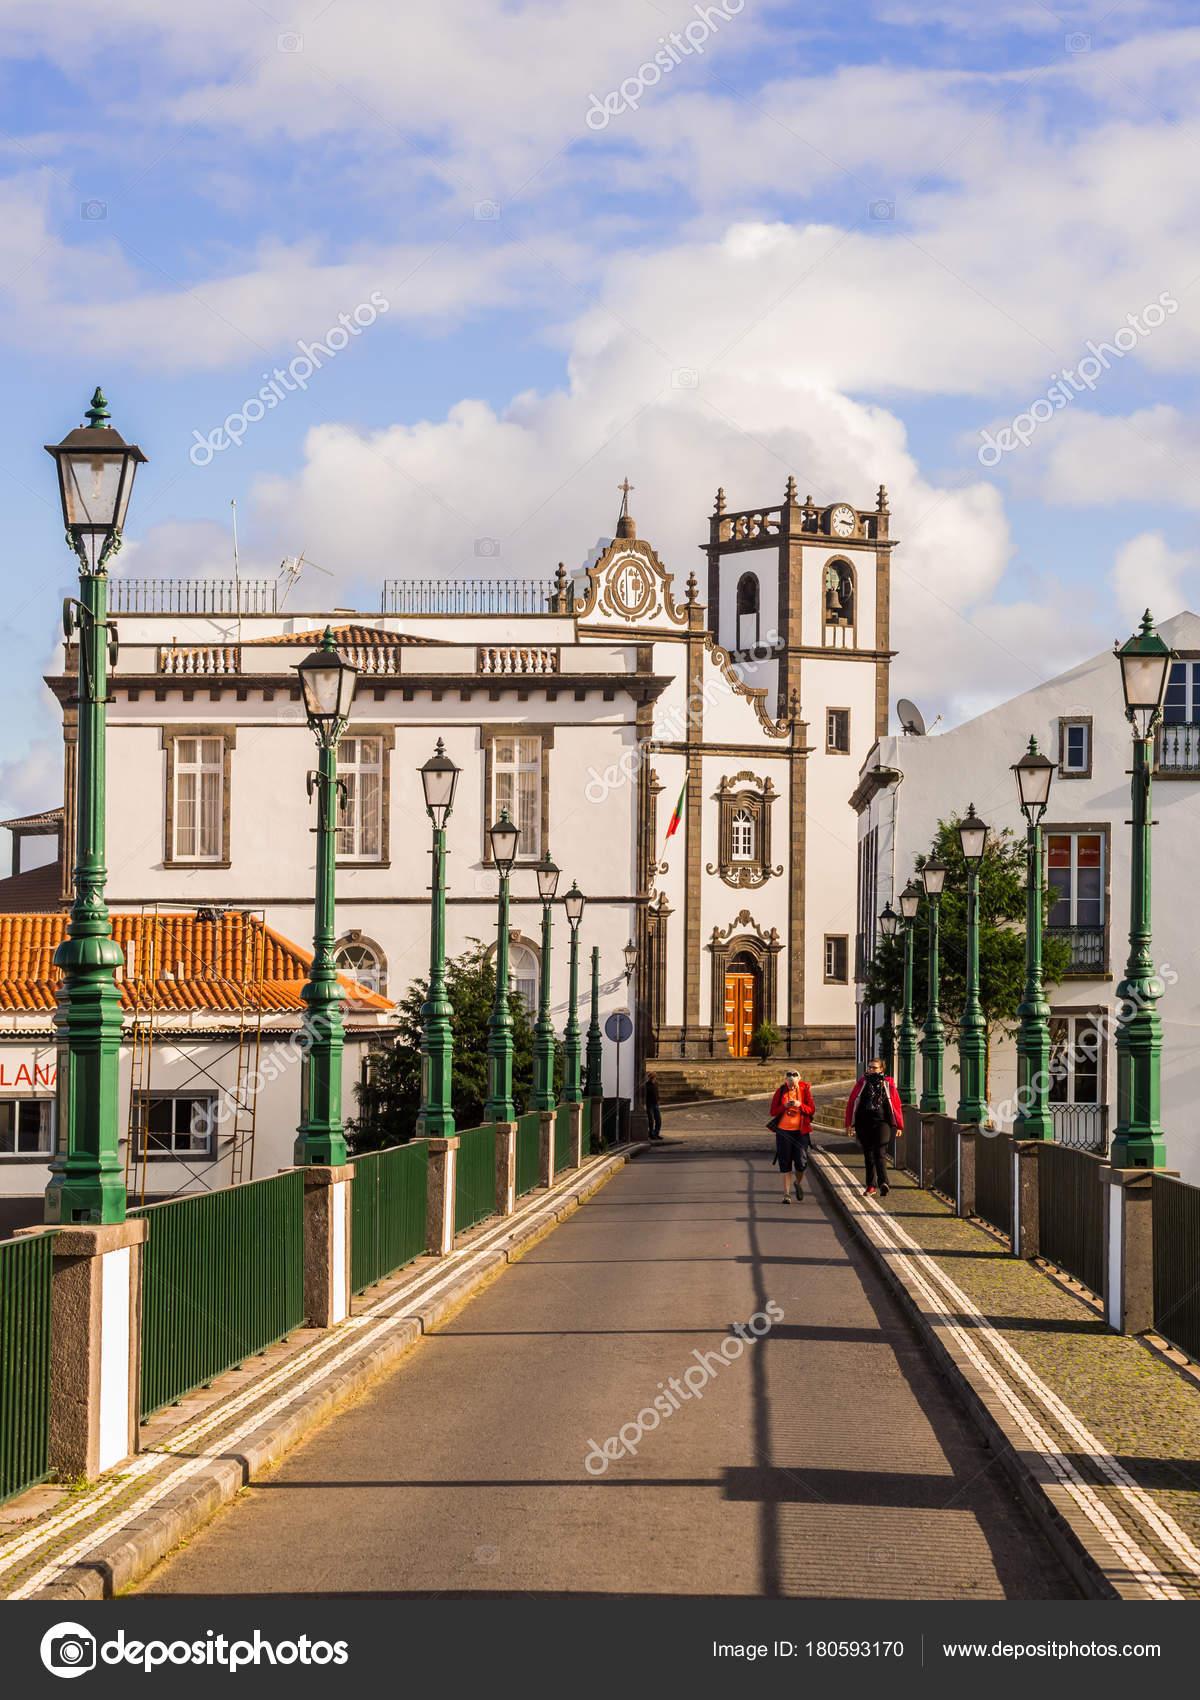 nordeste a ores portugal 1er novembre 2017 nordeste dans le sao photo ditoriale magdalena. Black Bedroom Furniture Sets. Home Design Ideas